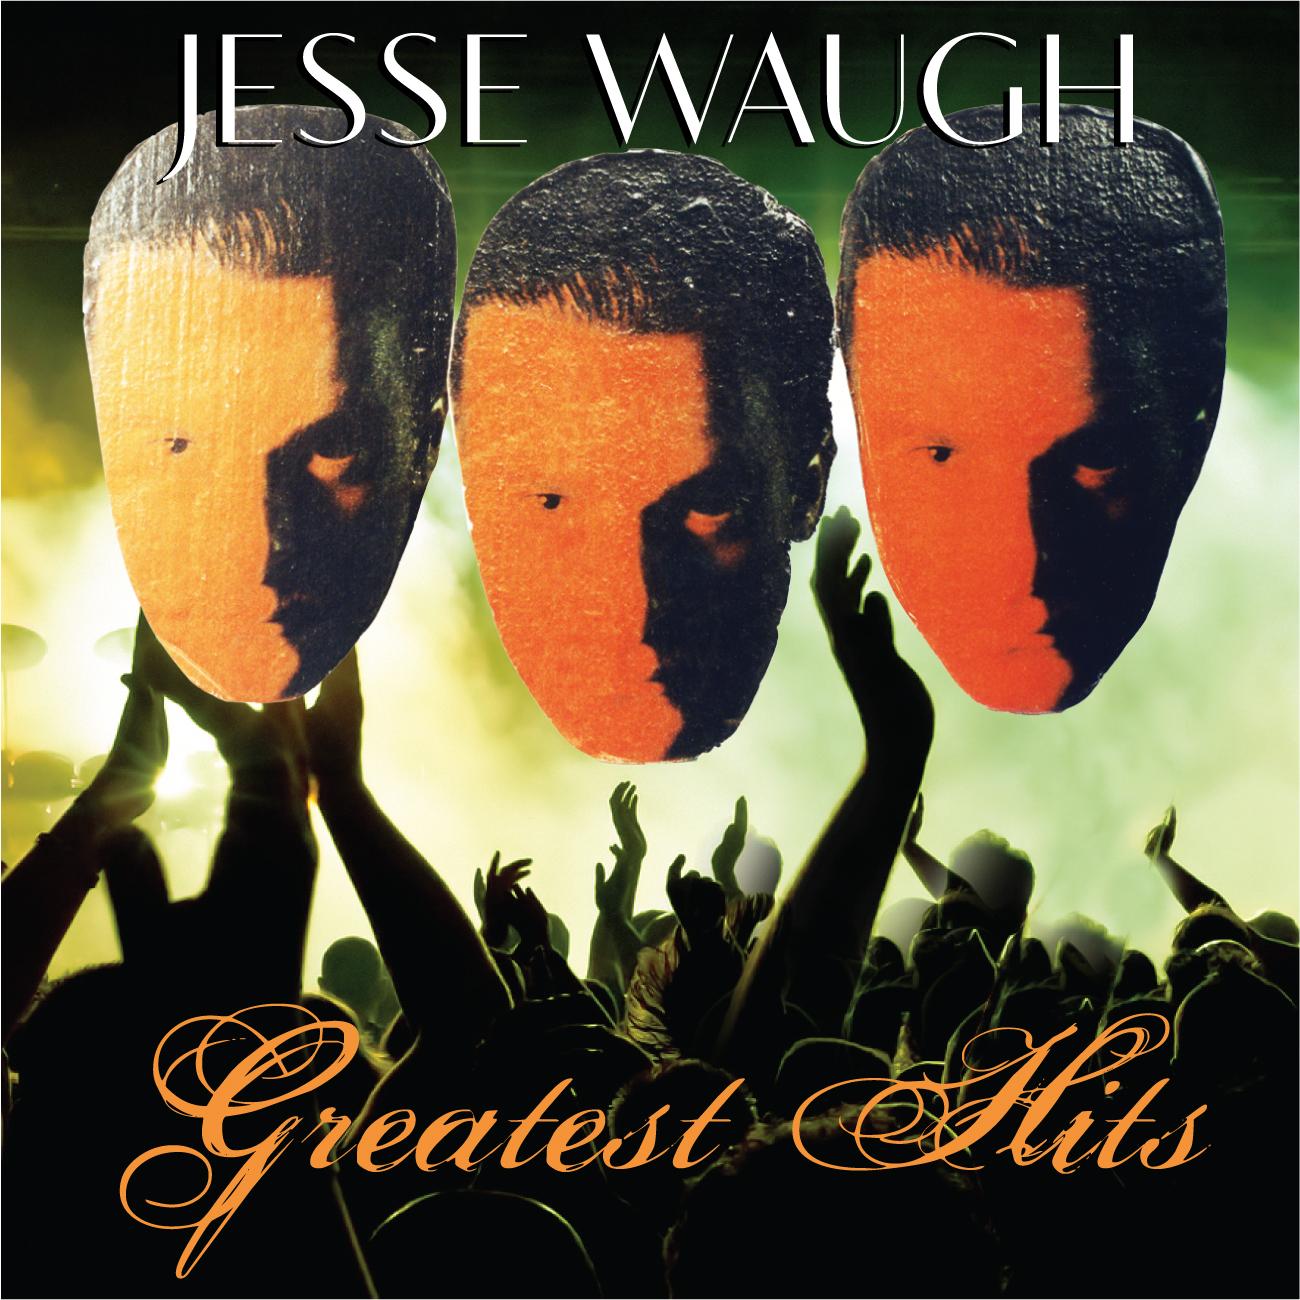 JESSE WAUGH GREATEST HITS